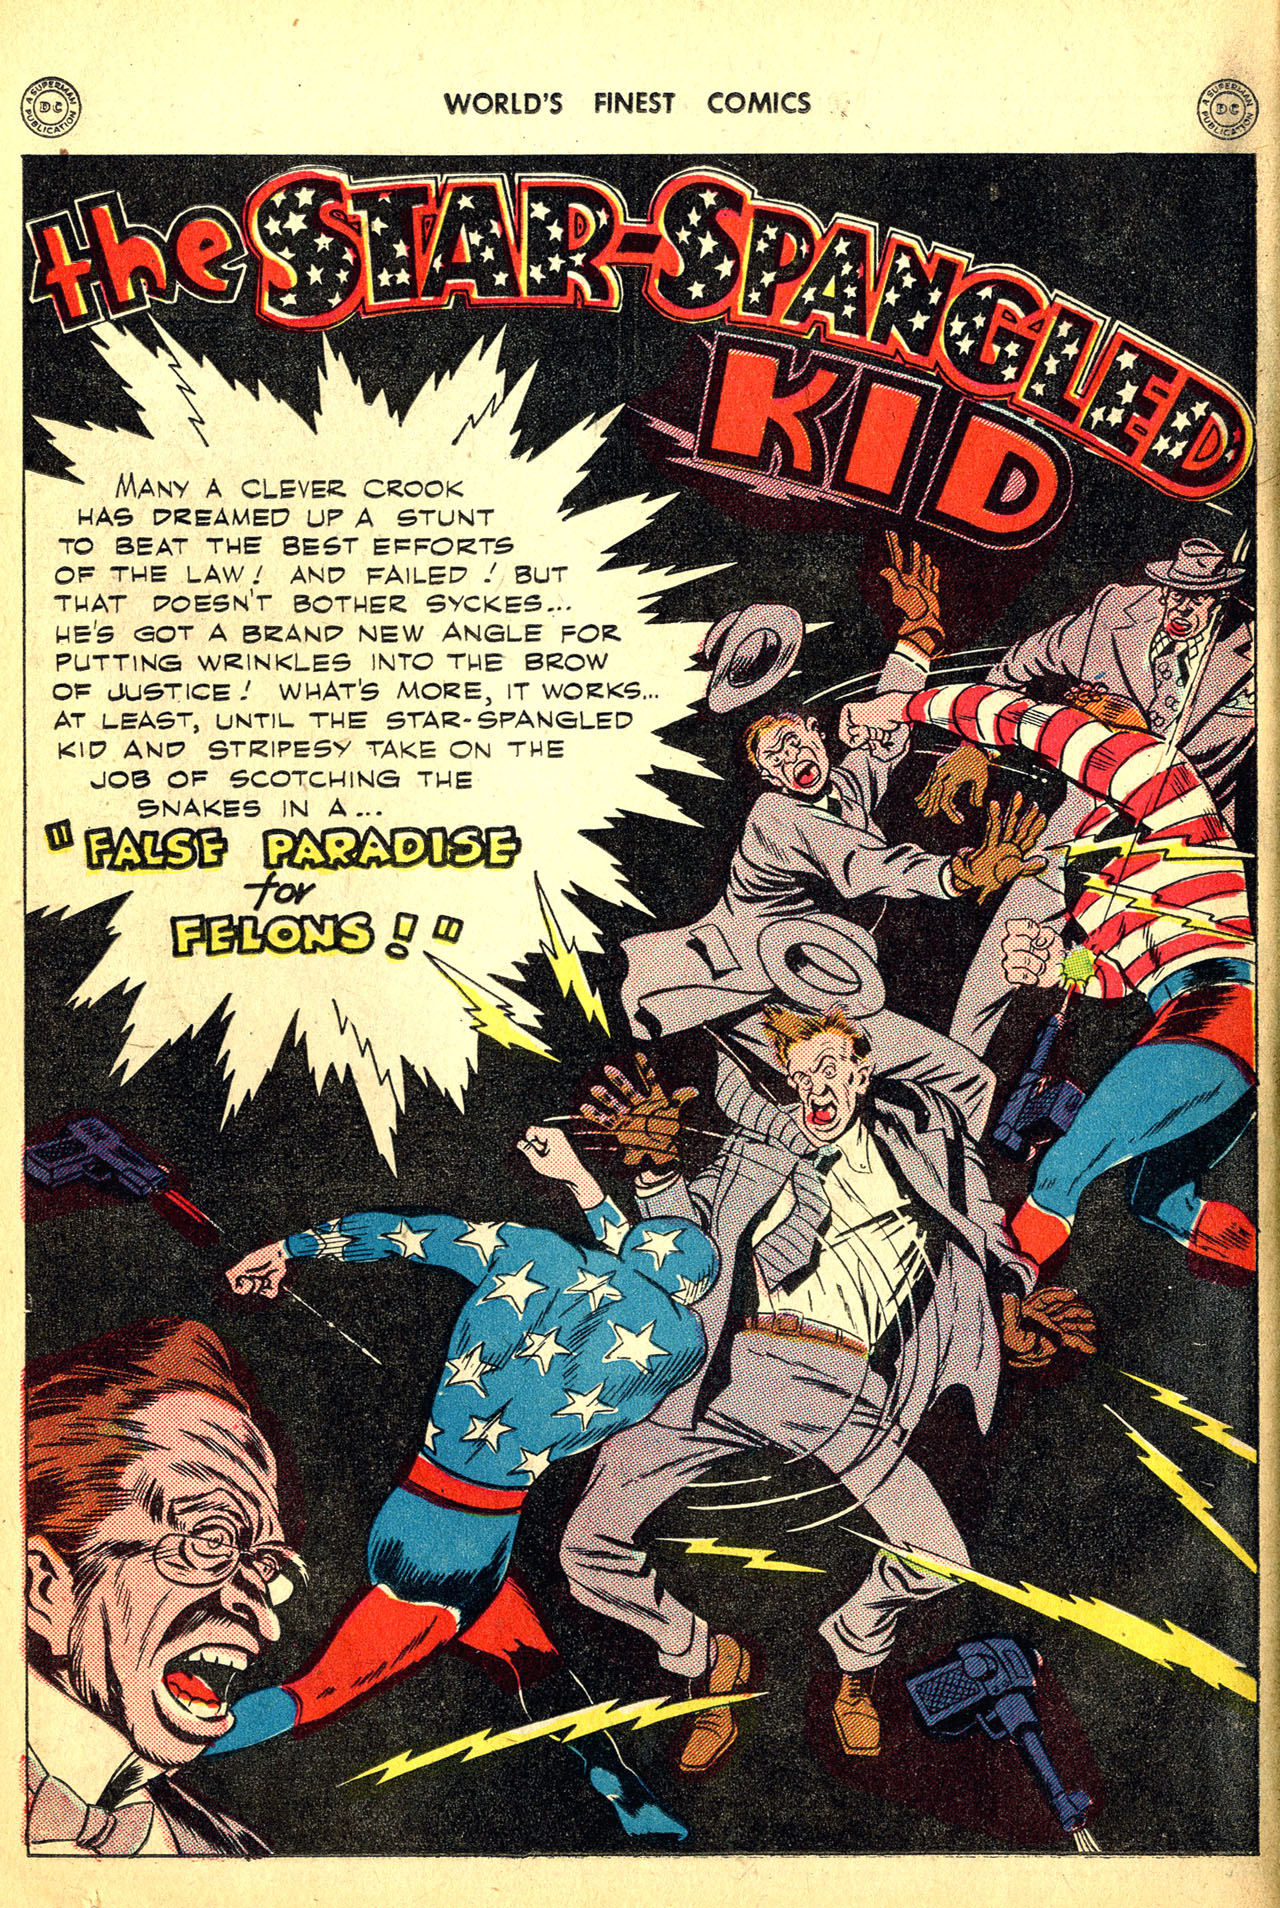 Read online World's Finest Comics comic -  Issue #18 - 16